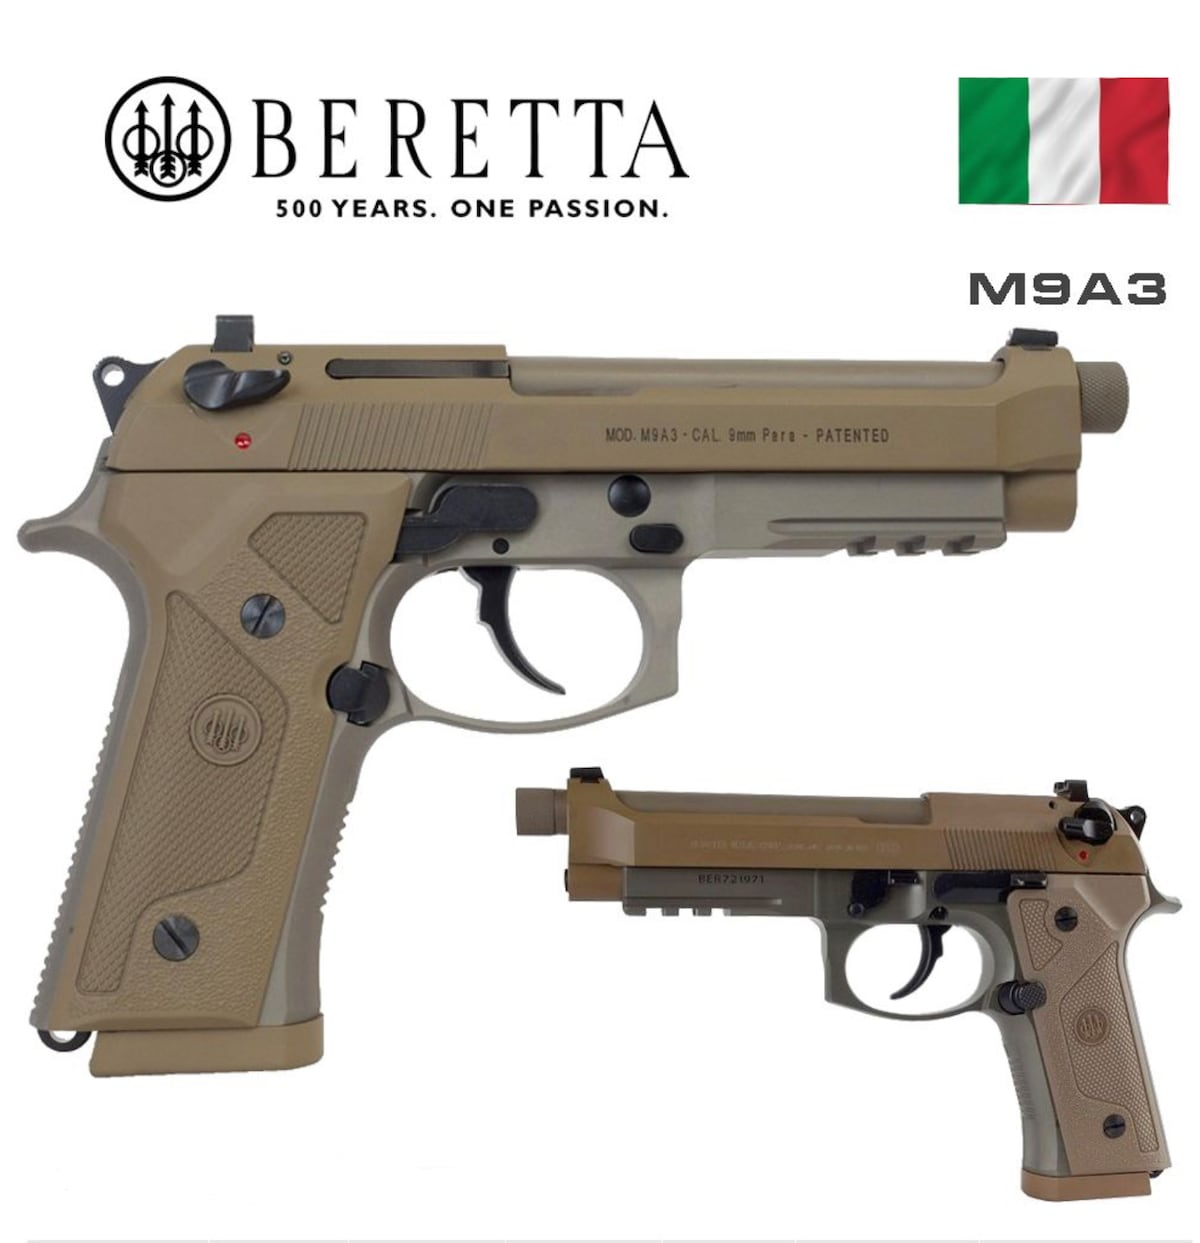 BERETTA M9A3 Type F JS92M9A3M THREADED